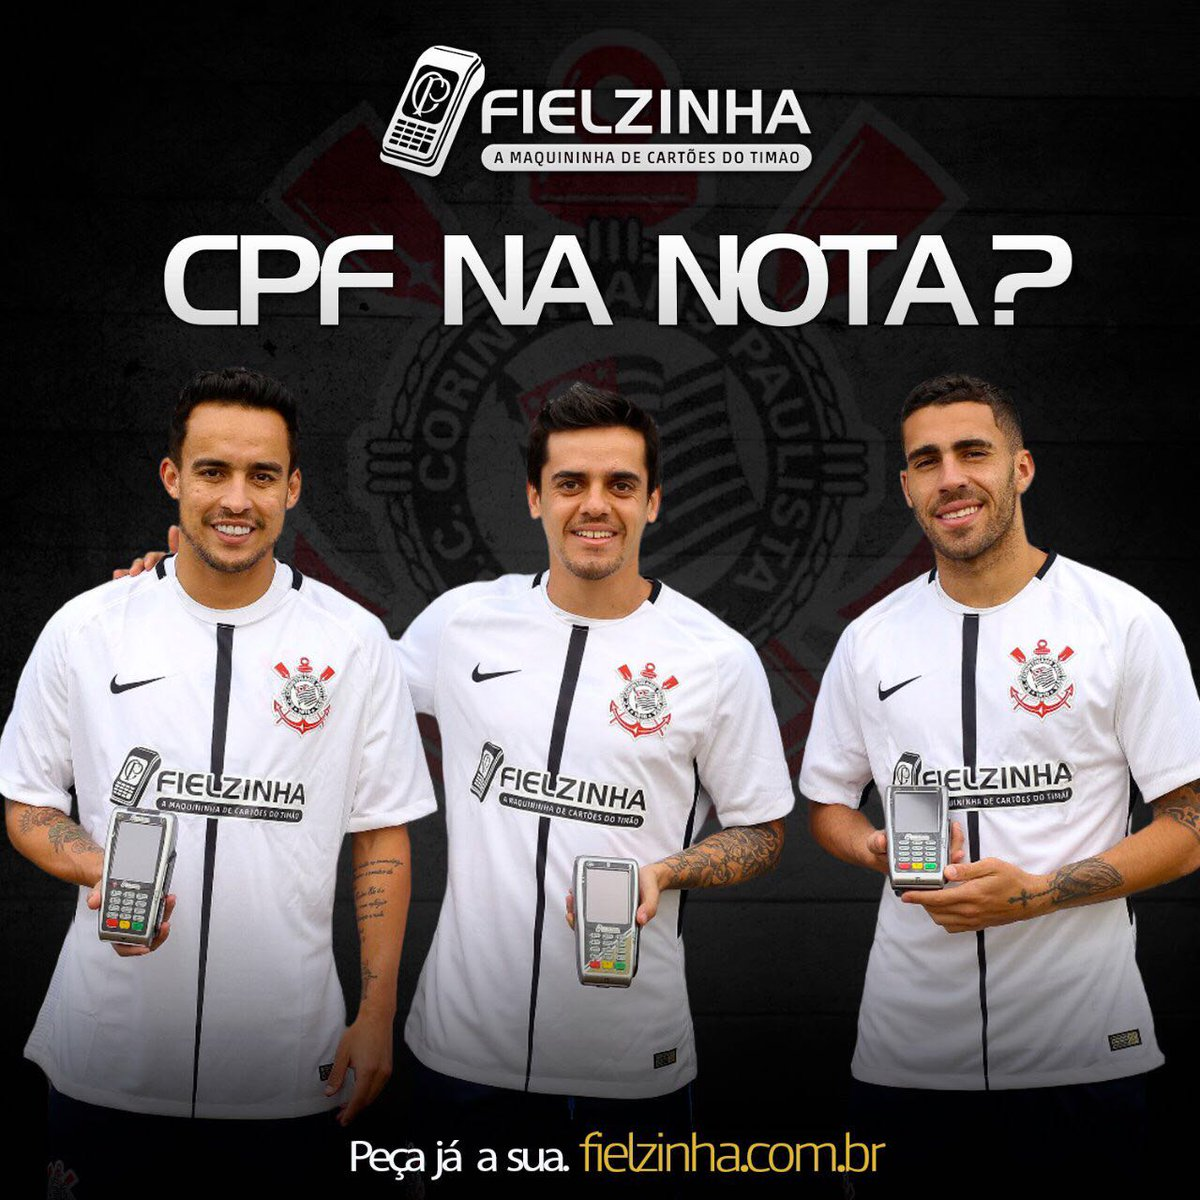 Joao Vitor Xavier On Twitter Cara Juro Que Li Cbf E A Piada Pronta